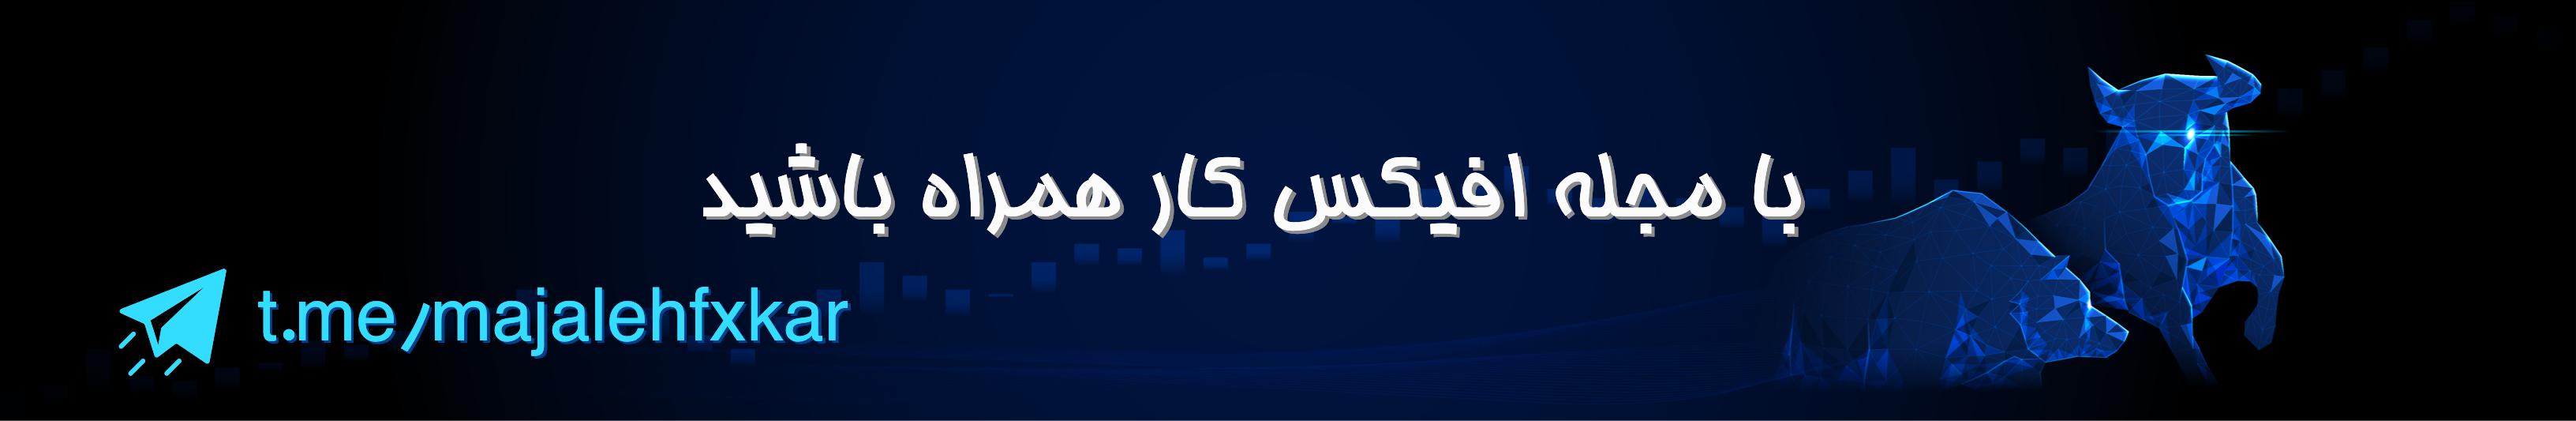 تلگرام مجله افیکس کار